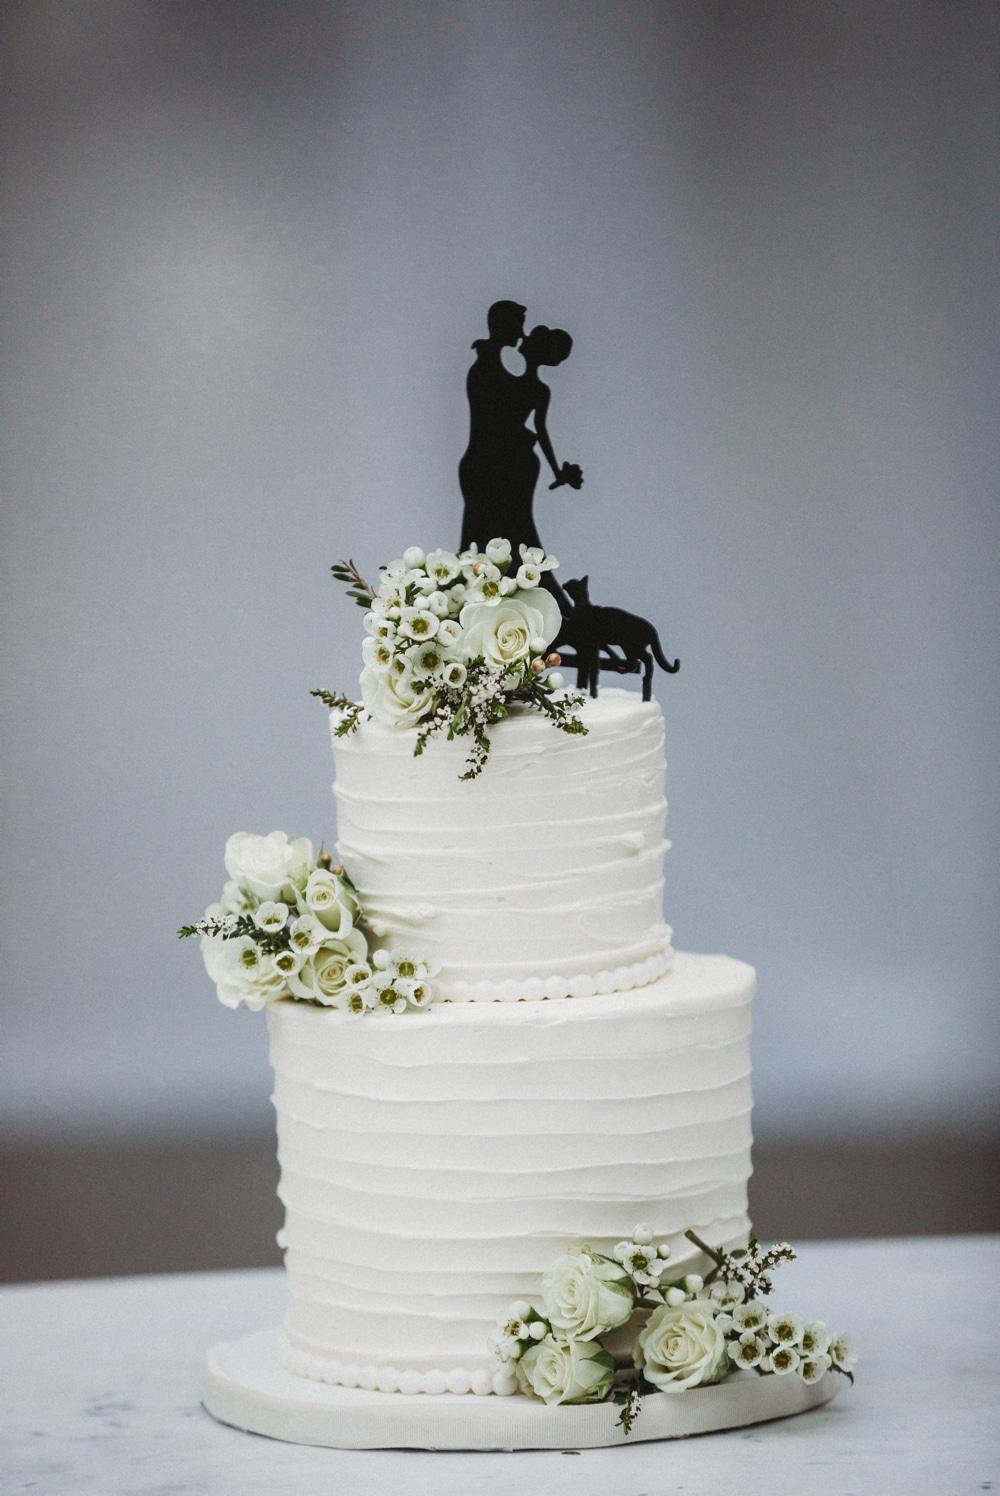 Enjoy Centre Weddings